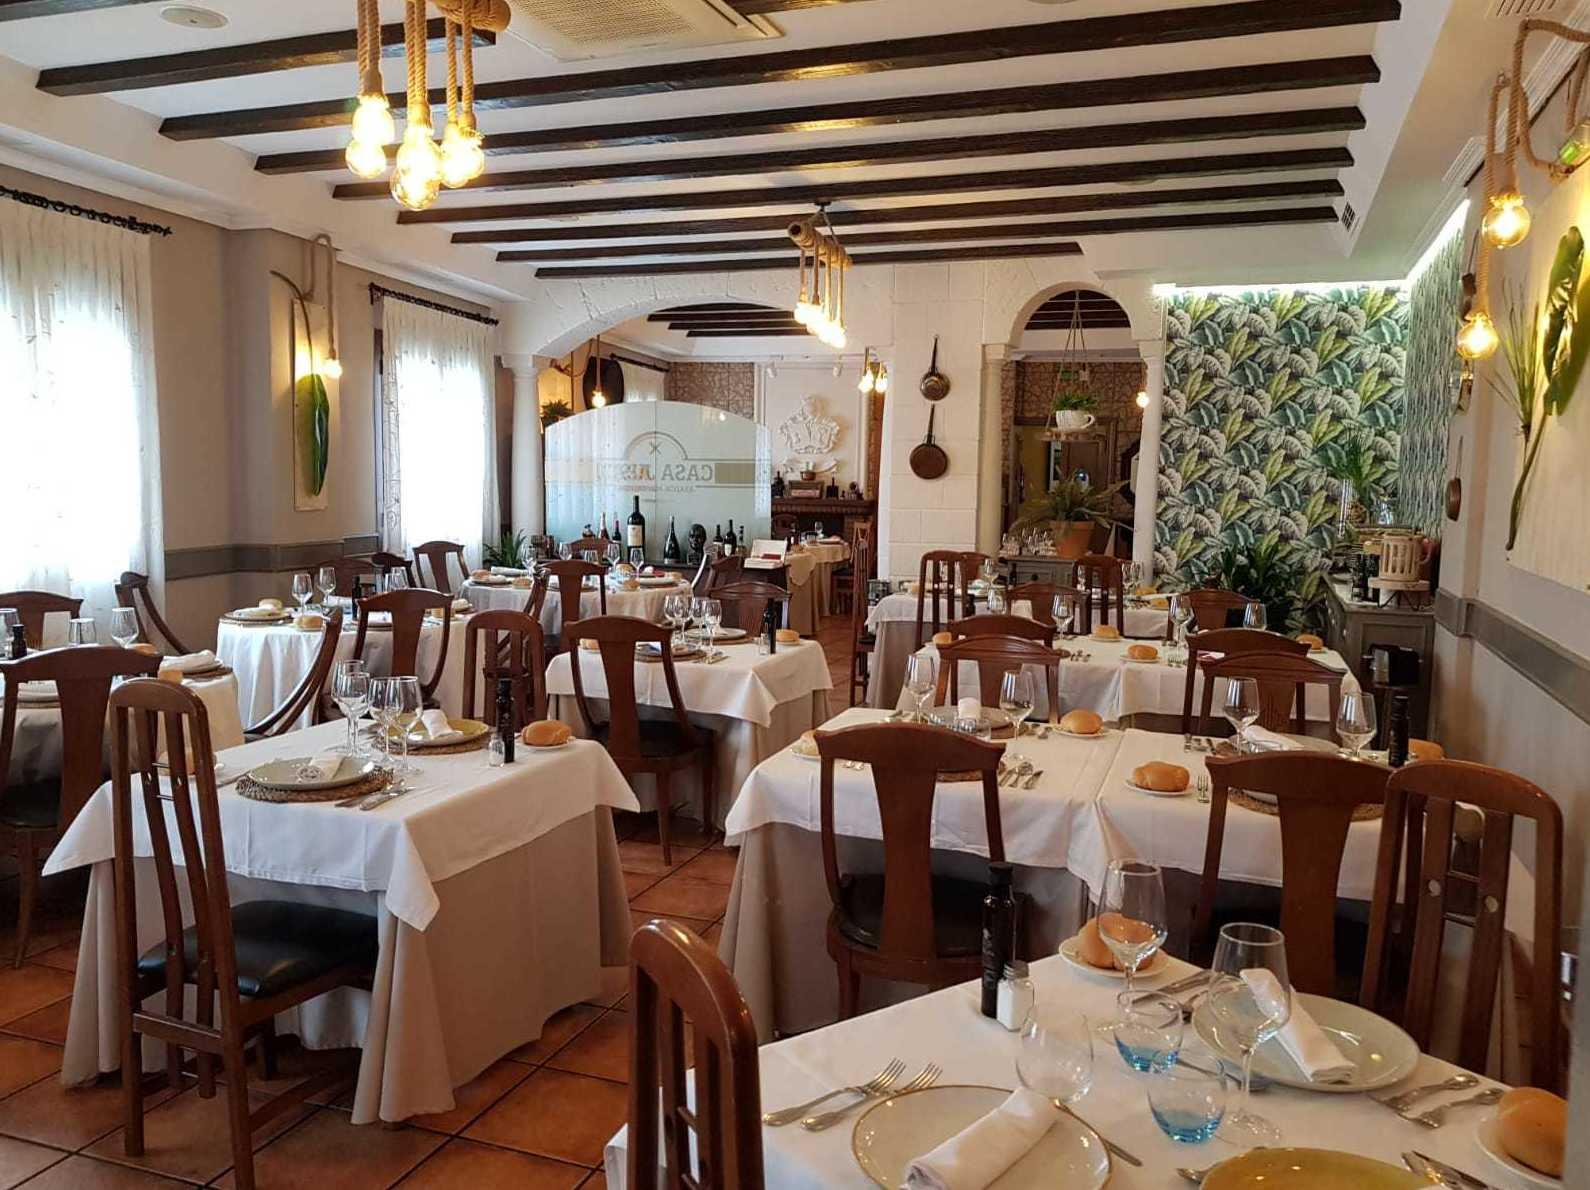 Foto 1 de Cocina castellano-manchega en Tomelloso | Restaurante Casa Justo